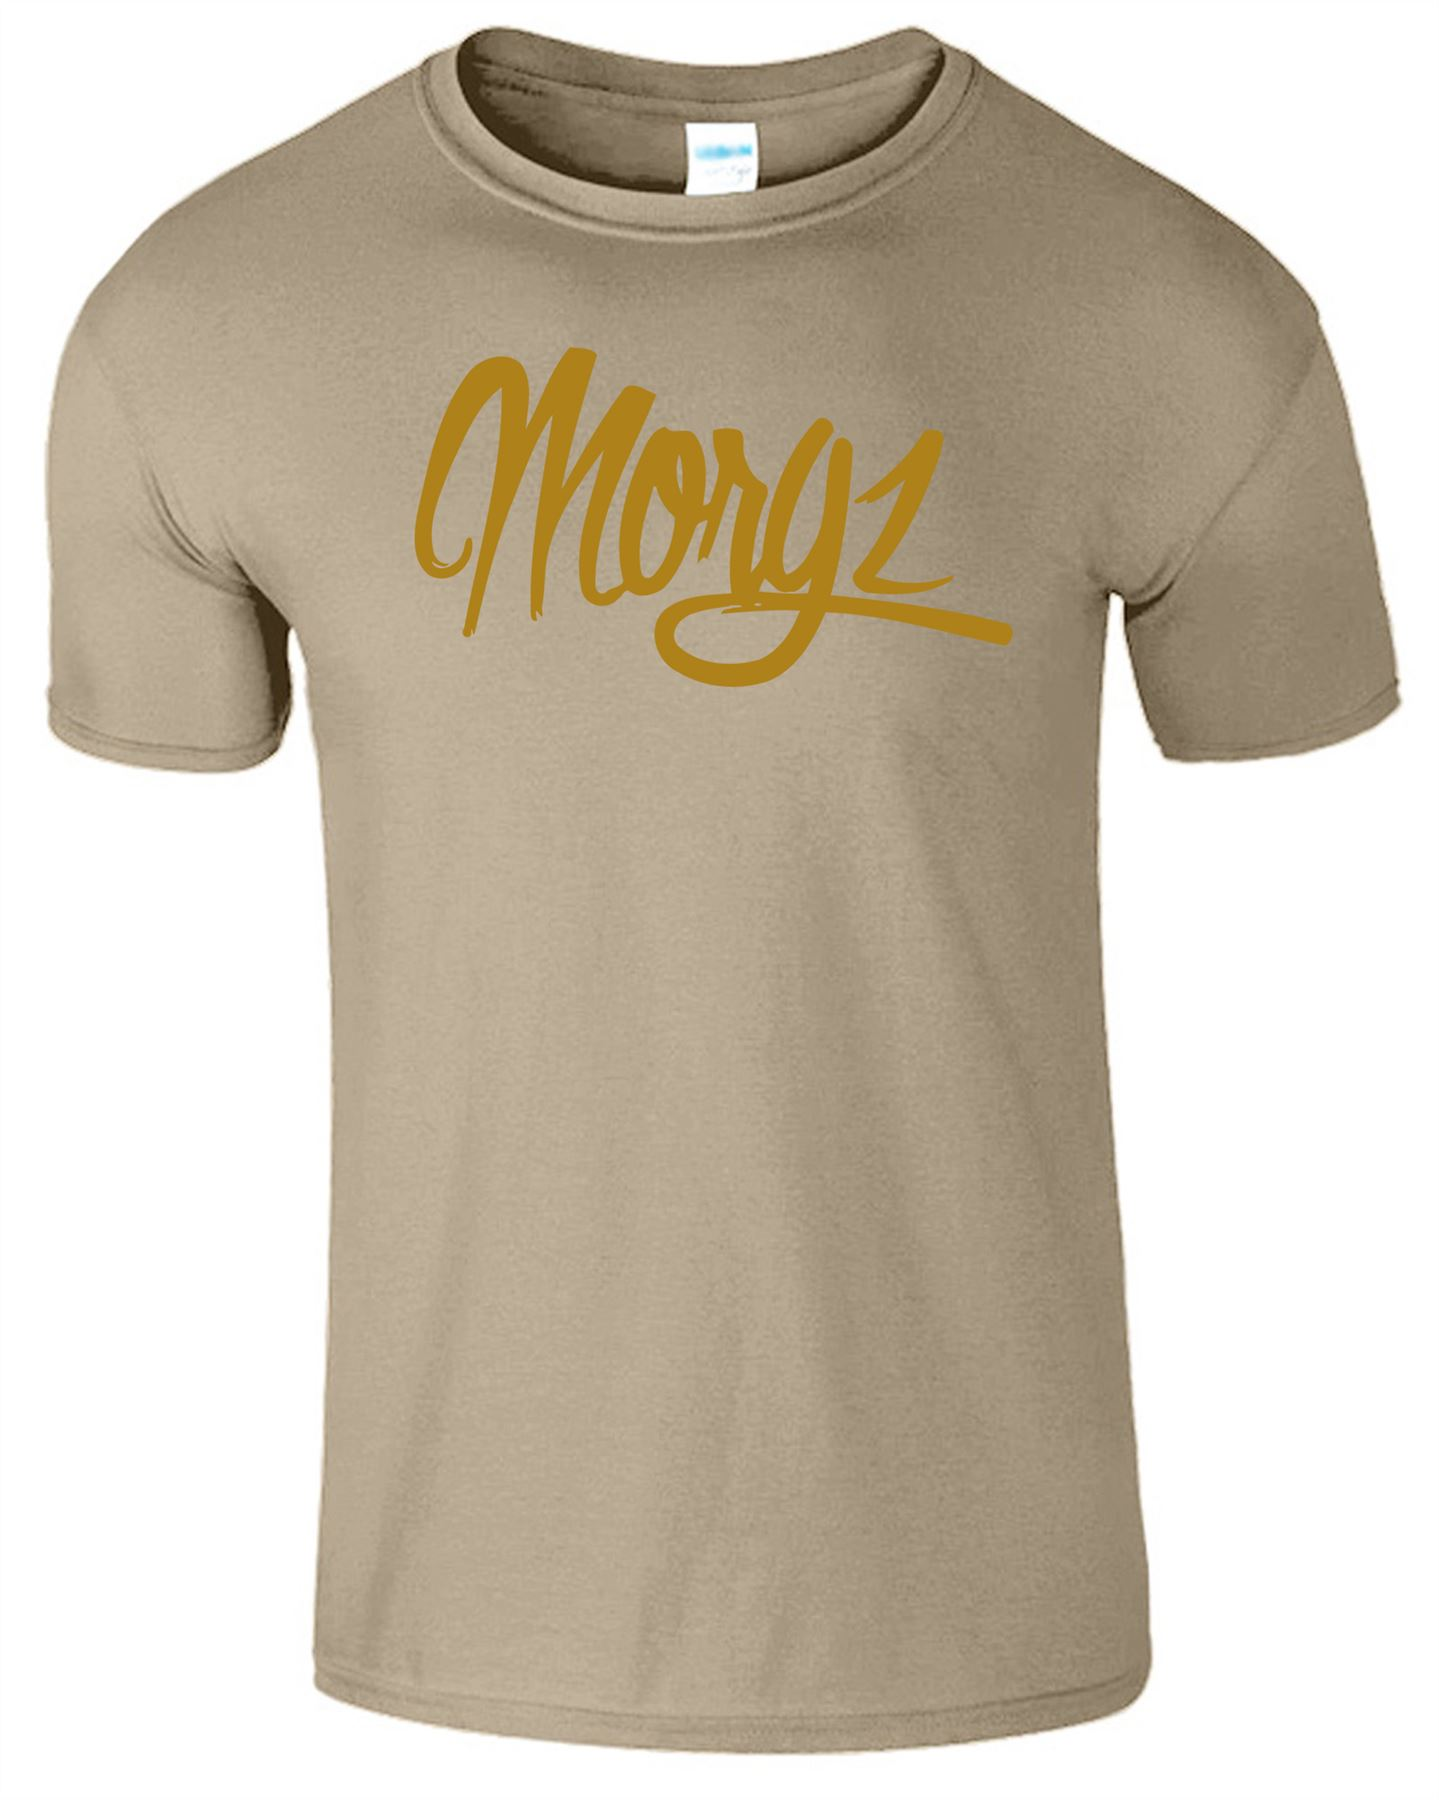 Morgz Youtuber Ladies T Shirt Inspired Gaming Gamer Womens Funny Top Tee